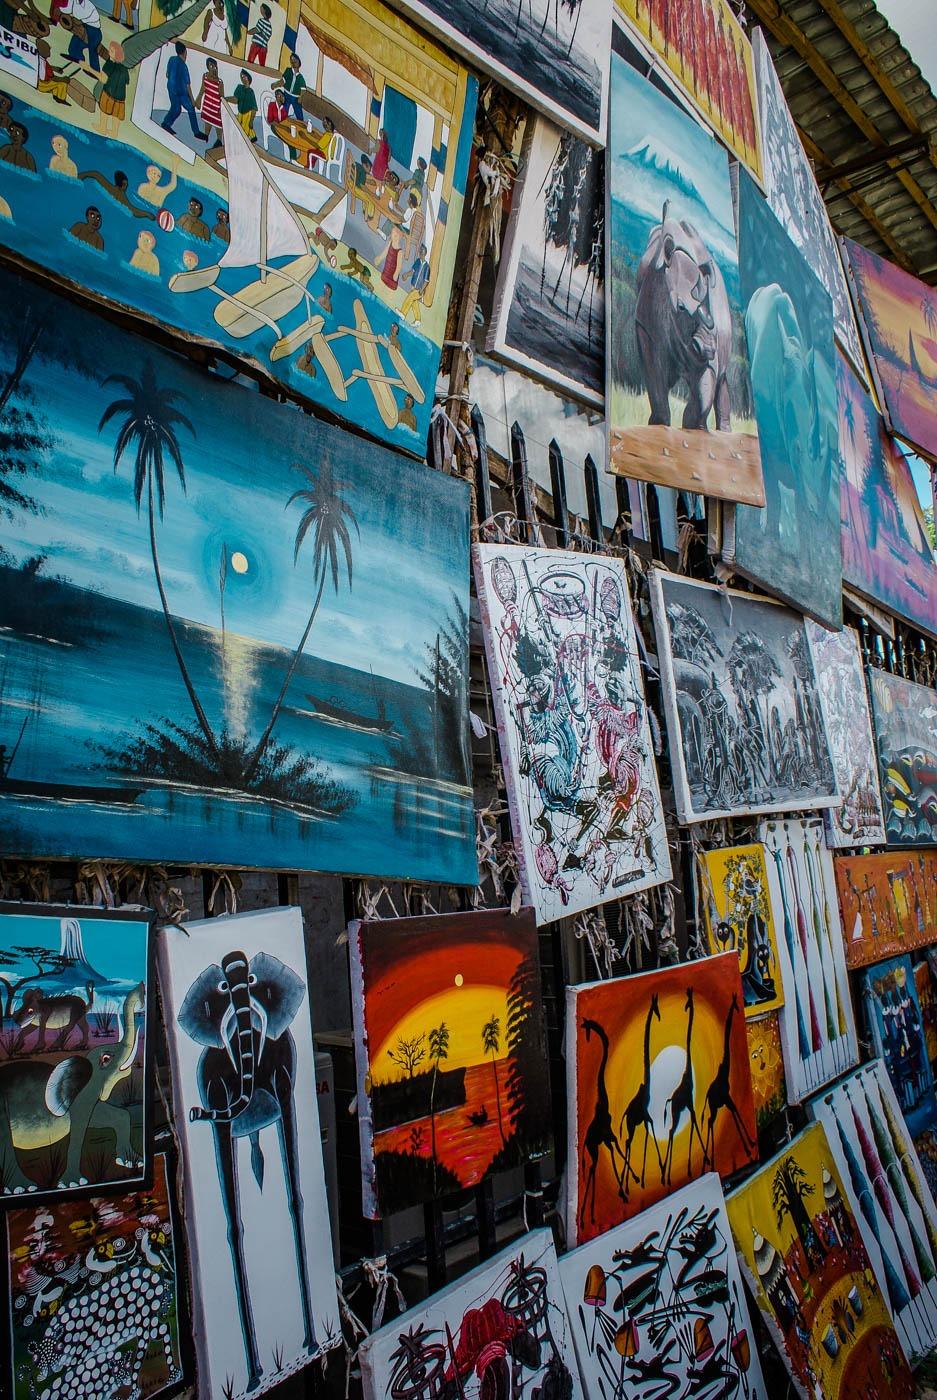 Art hundintg - Tanzania and Zanzibar - an exotic adventure. Beaches I Stone Town I Africa Travel I Dar Es Salaam #traveldestinations #traveltheworld #tanzania